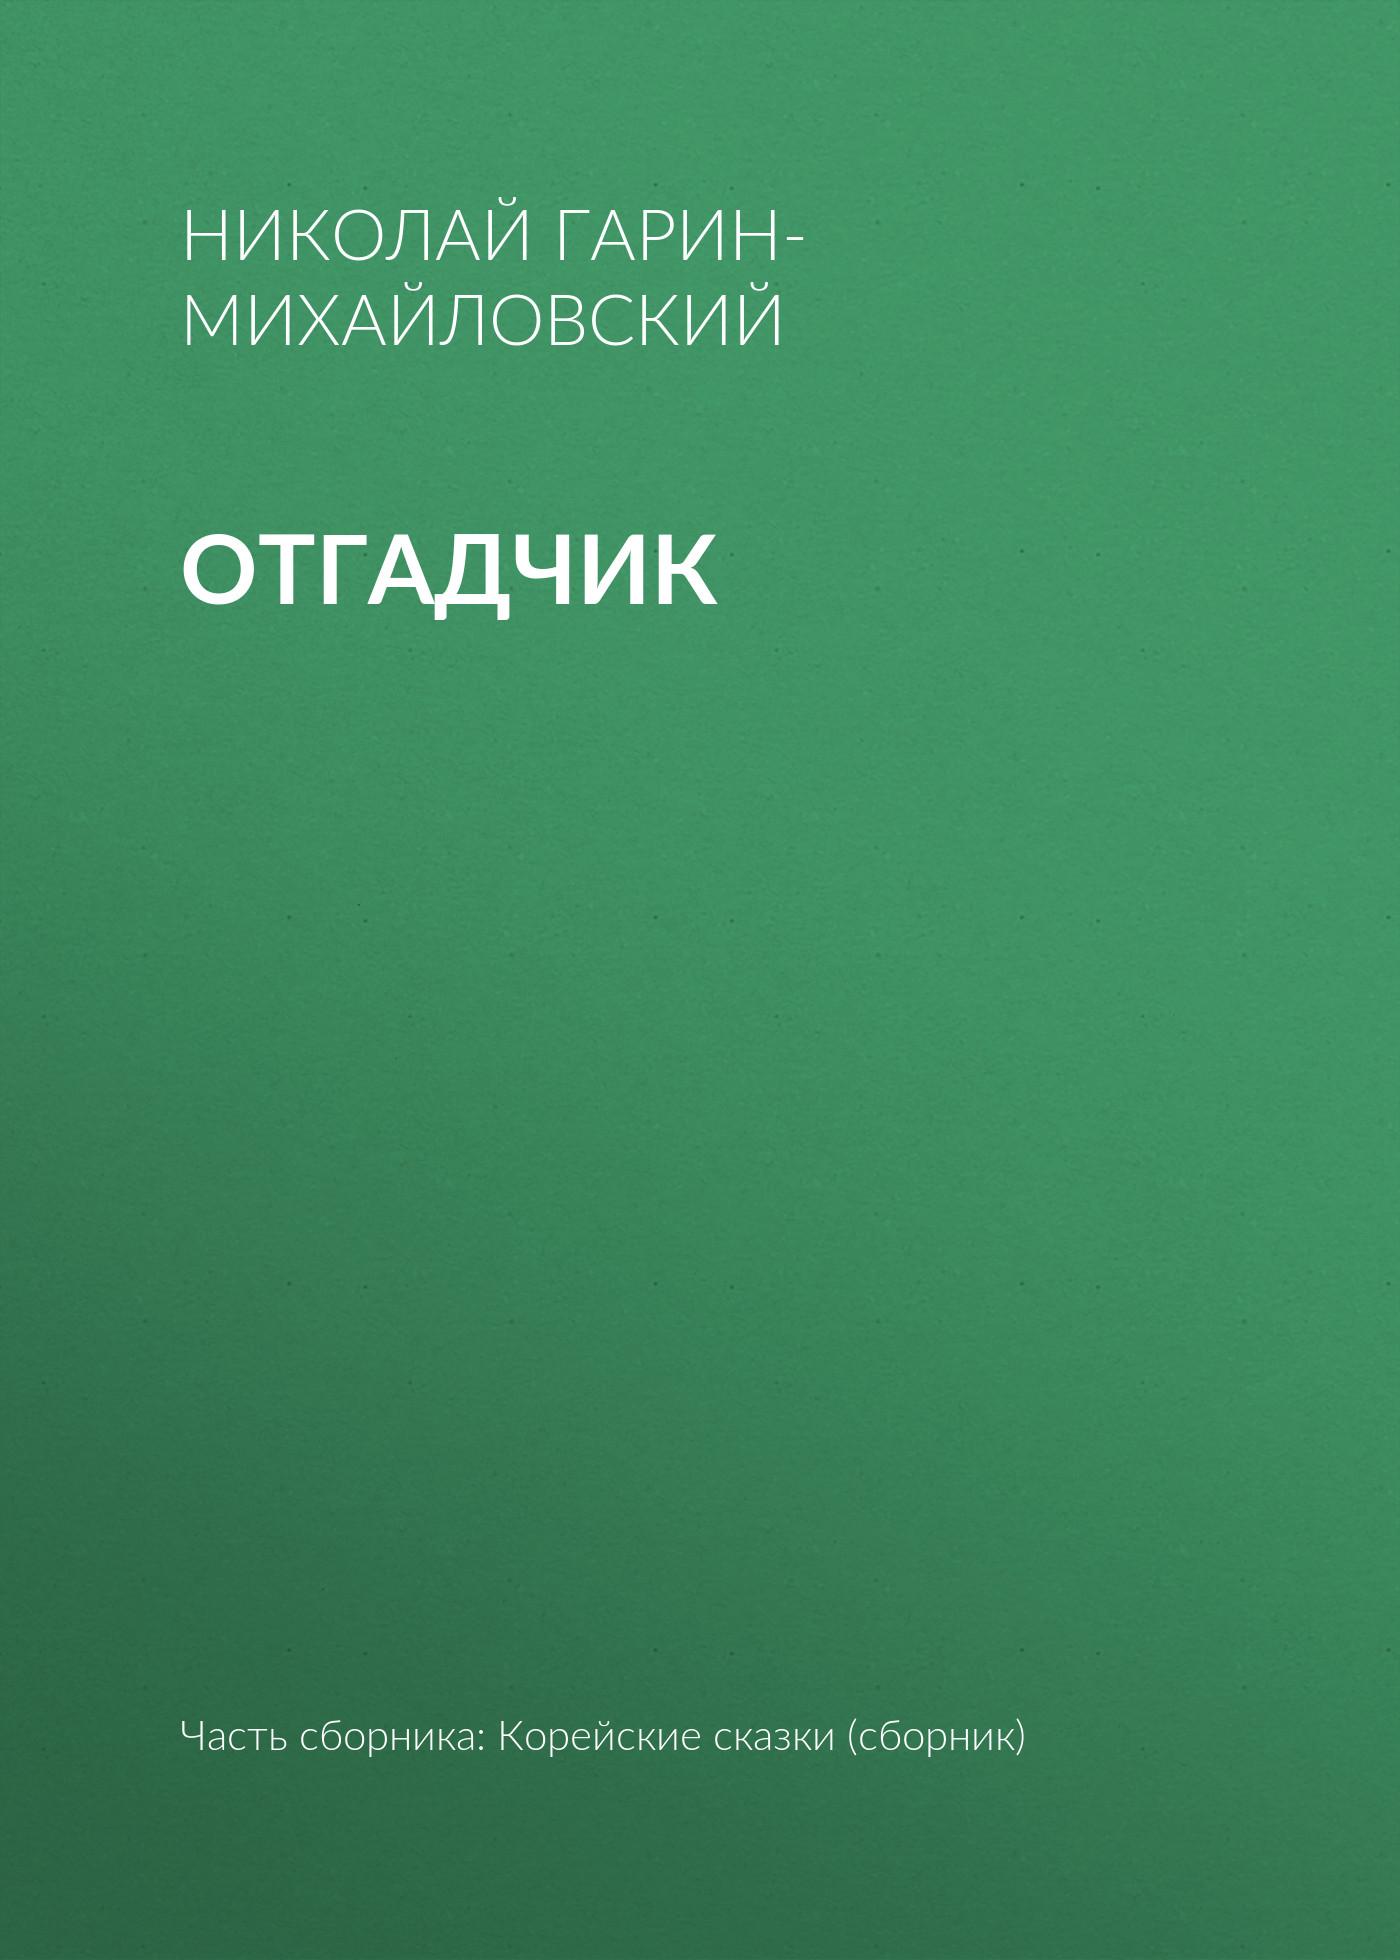 Николай Гарин-Михайловский Отгадчик тори унгу